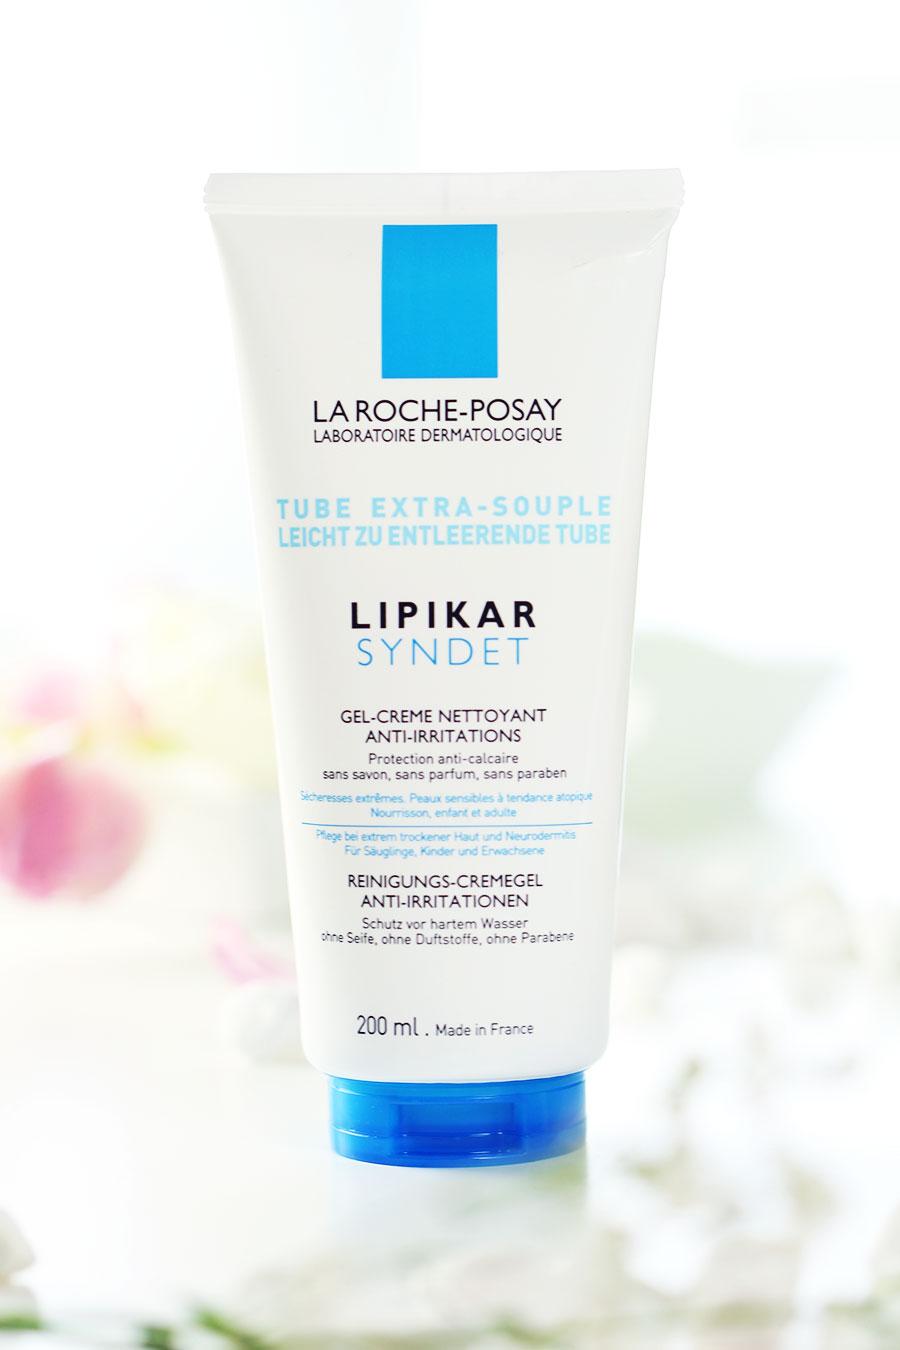 La-Roche-Posay-LipiKar-Syndet